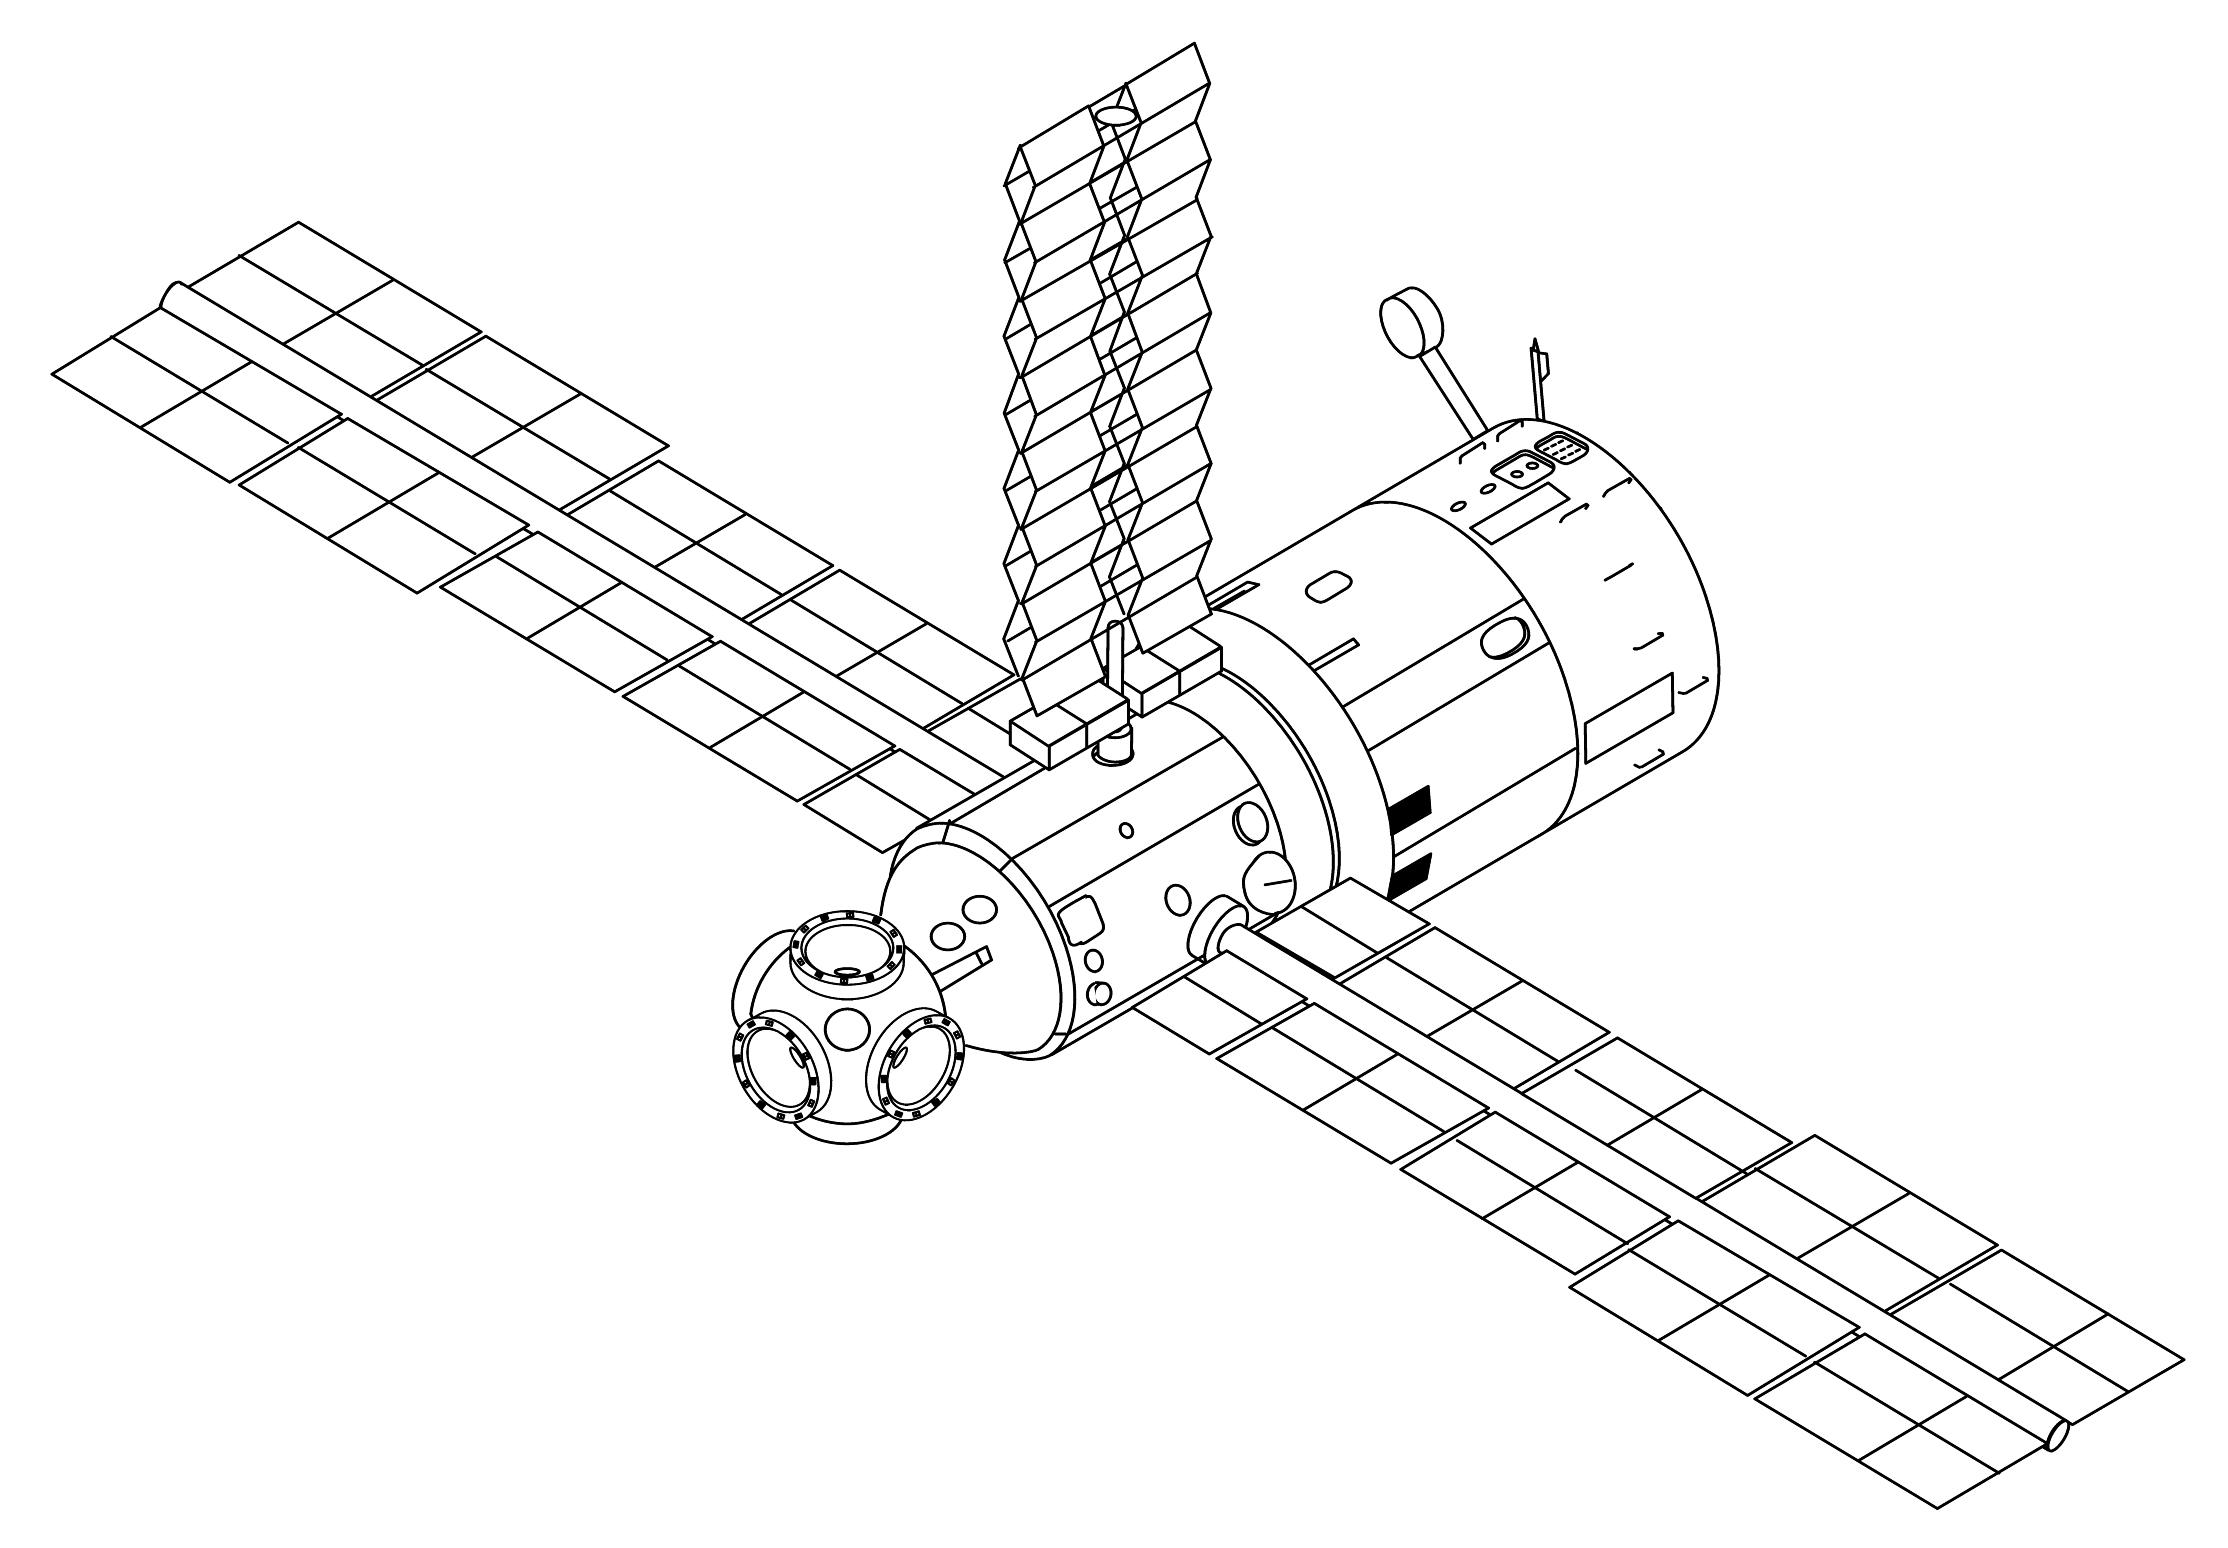 File:Mir Core Module Three Panels 1987 configuration